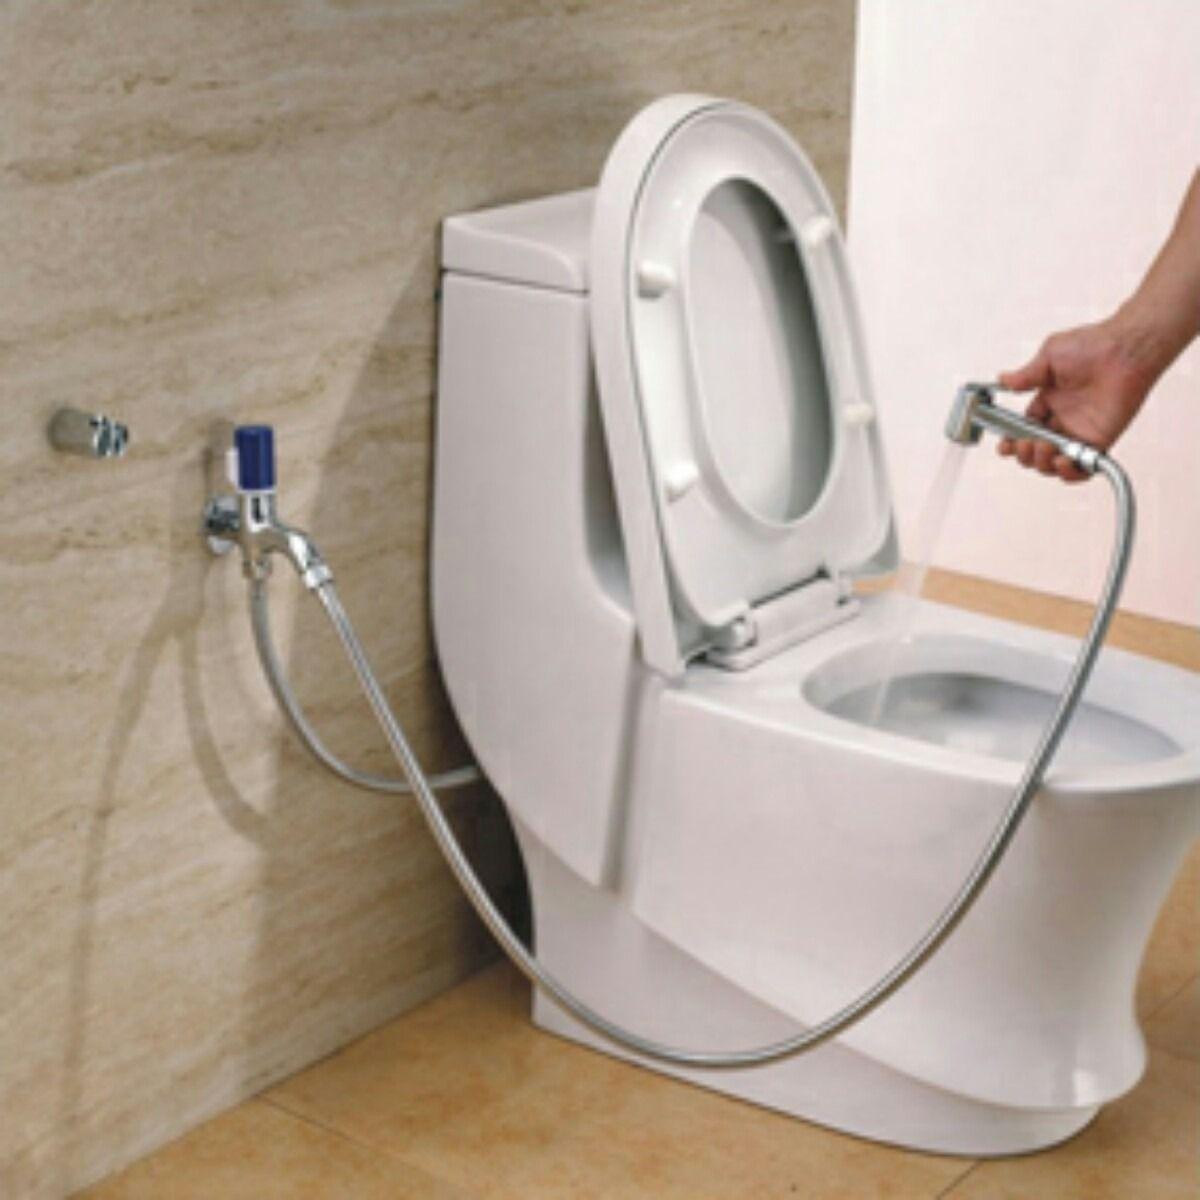 grifo inodoro bidet ducha higiénica leroy merlin - Buscar con